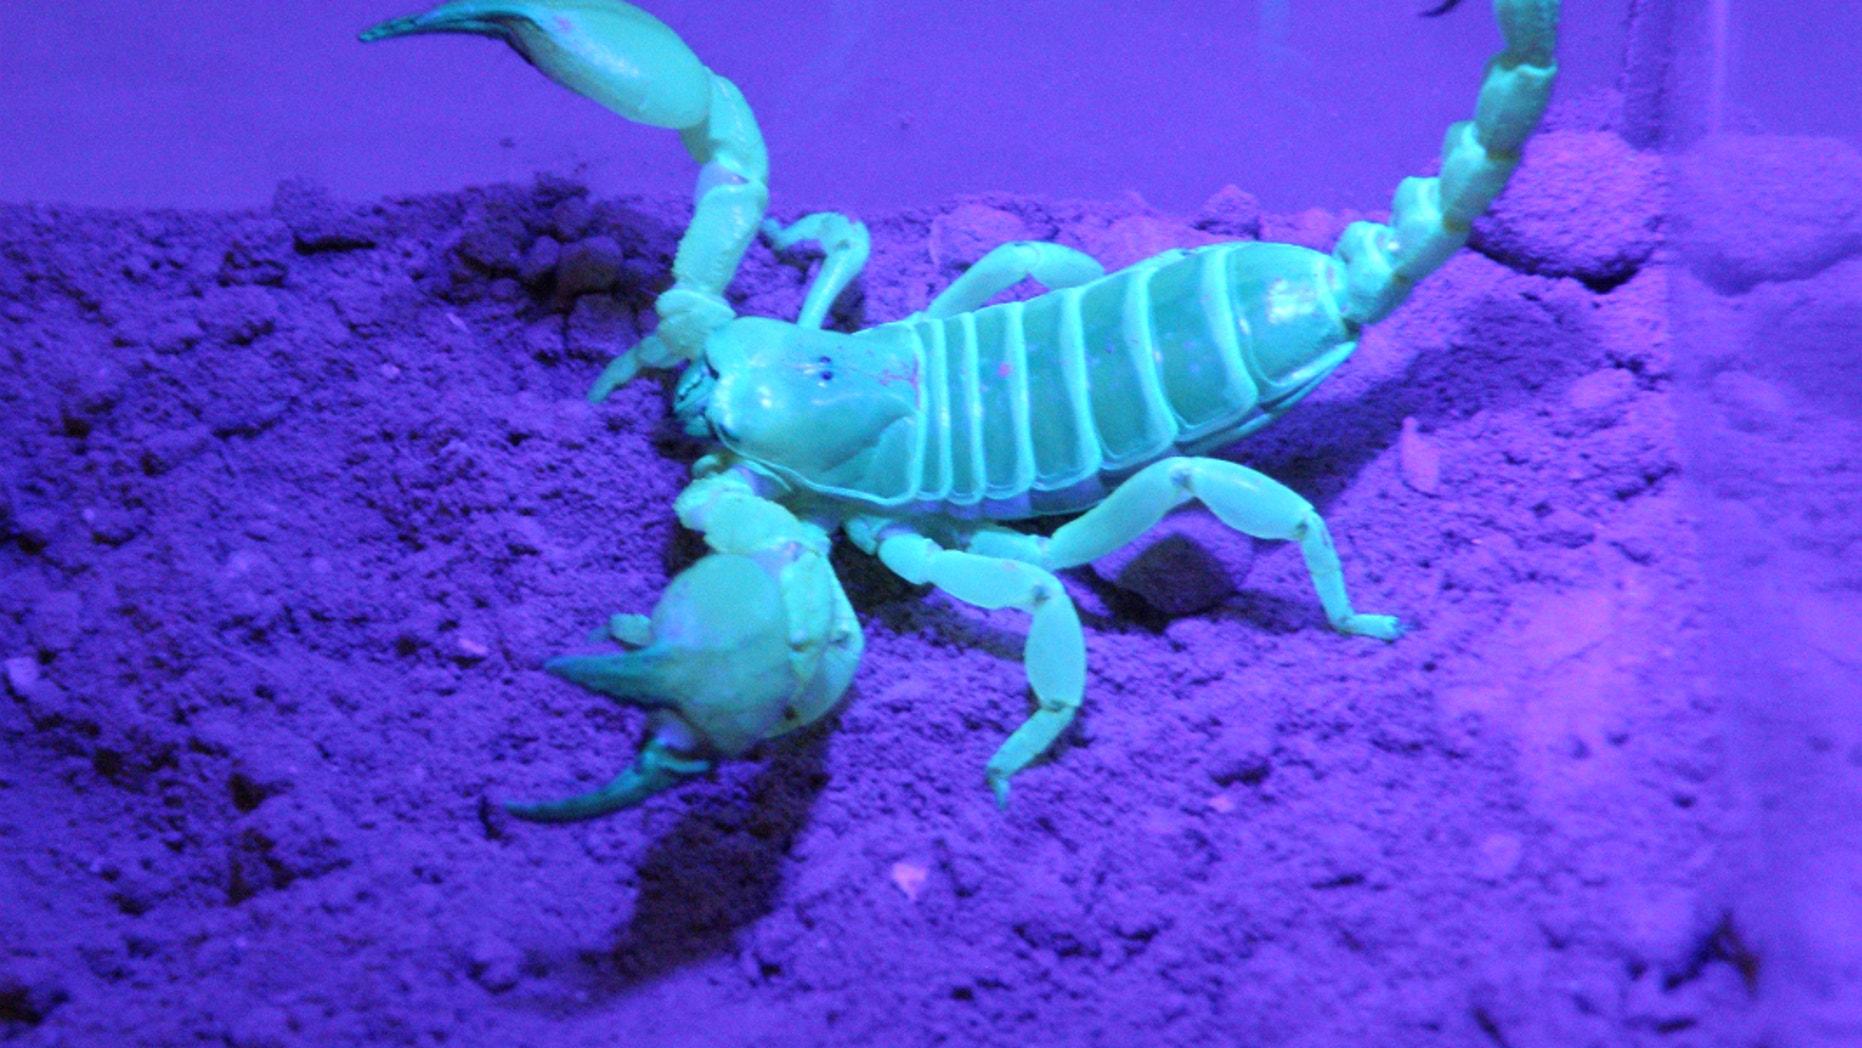 A scorpion, Scorpio palmatus, under ultraviolet light.